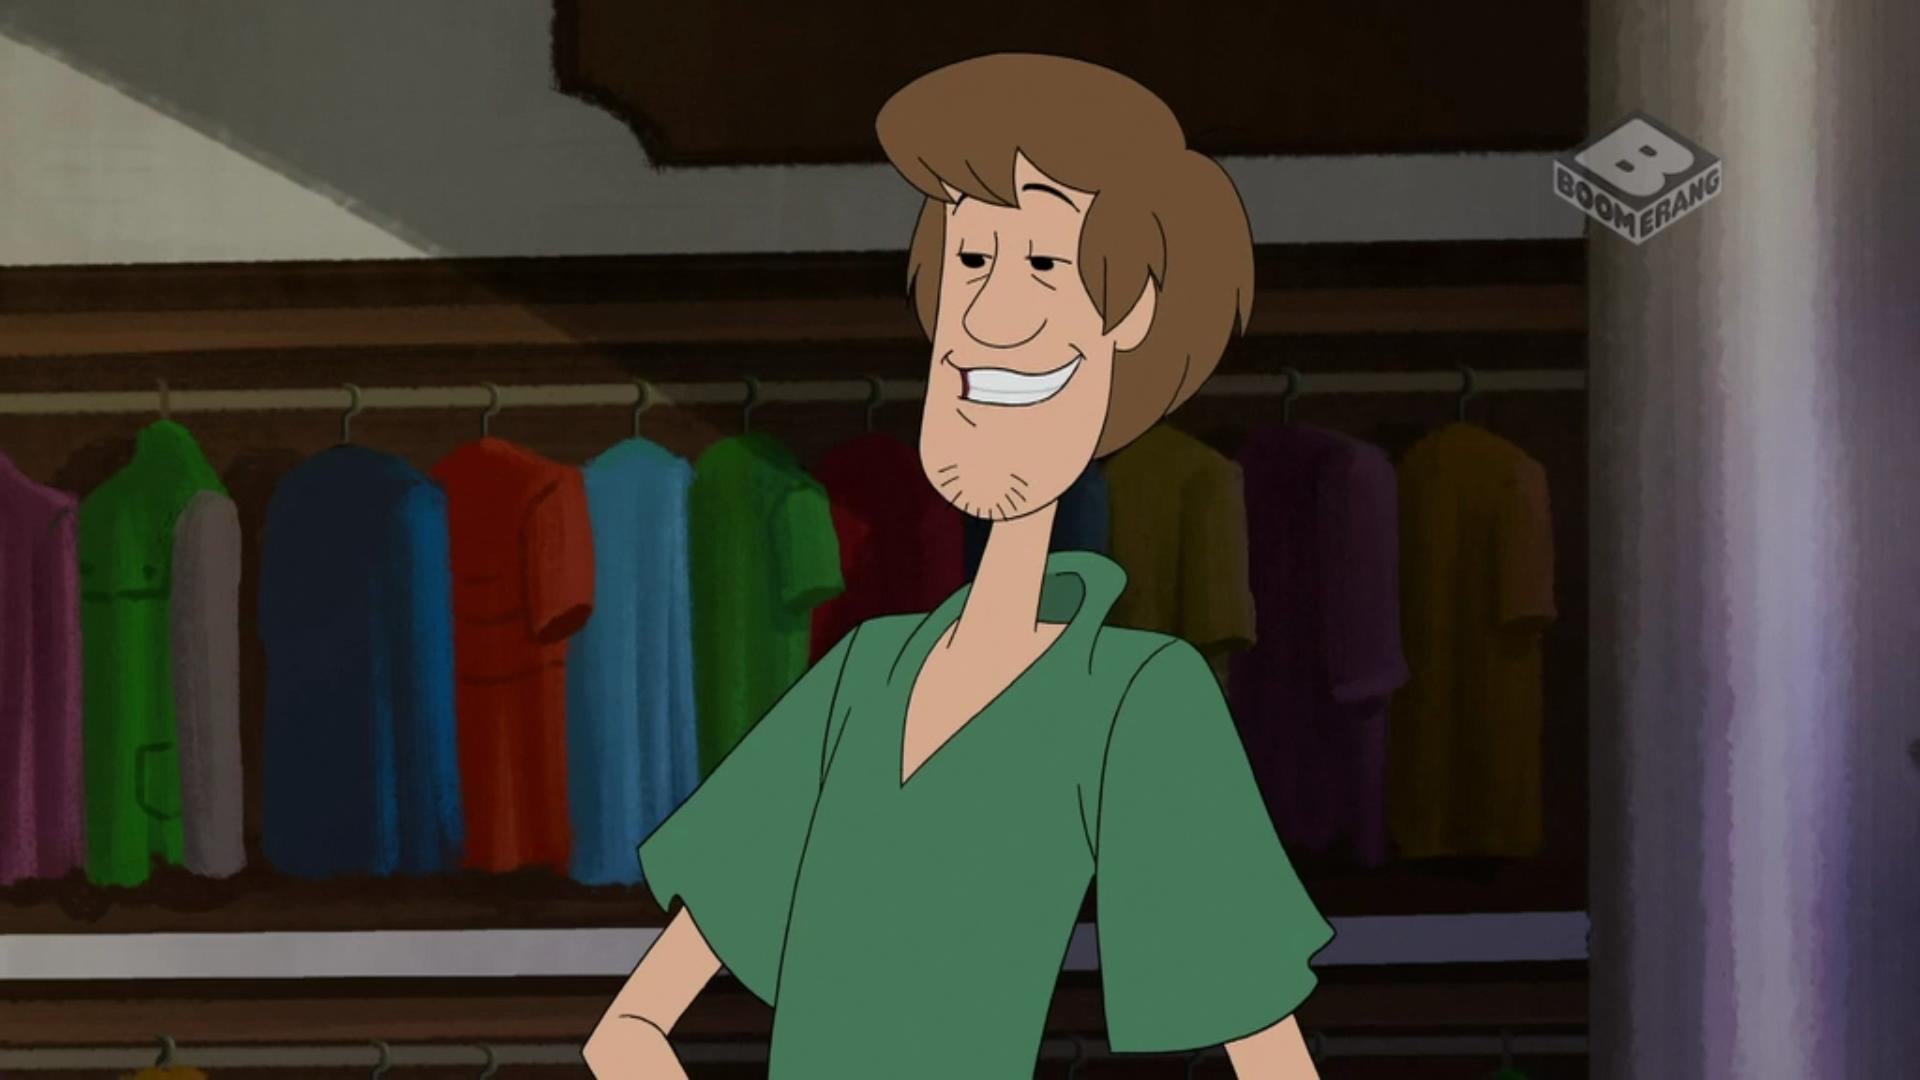 Amazing Shaggy Rogers Scoobypedia Fandom Powered By Wikia Short Hairstyles Gunalazisus